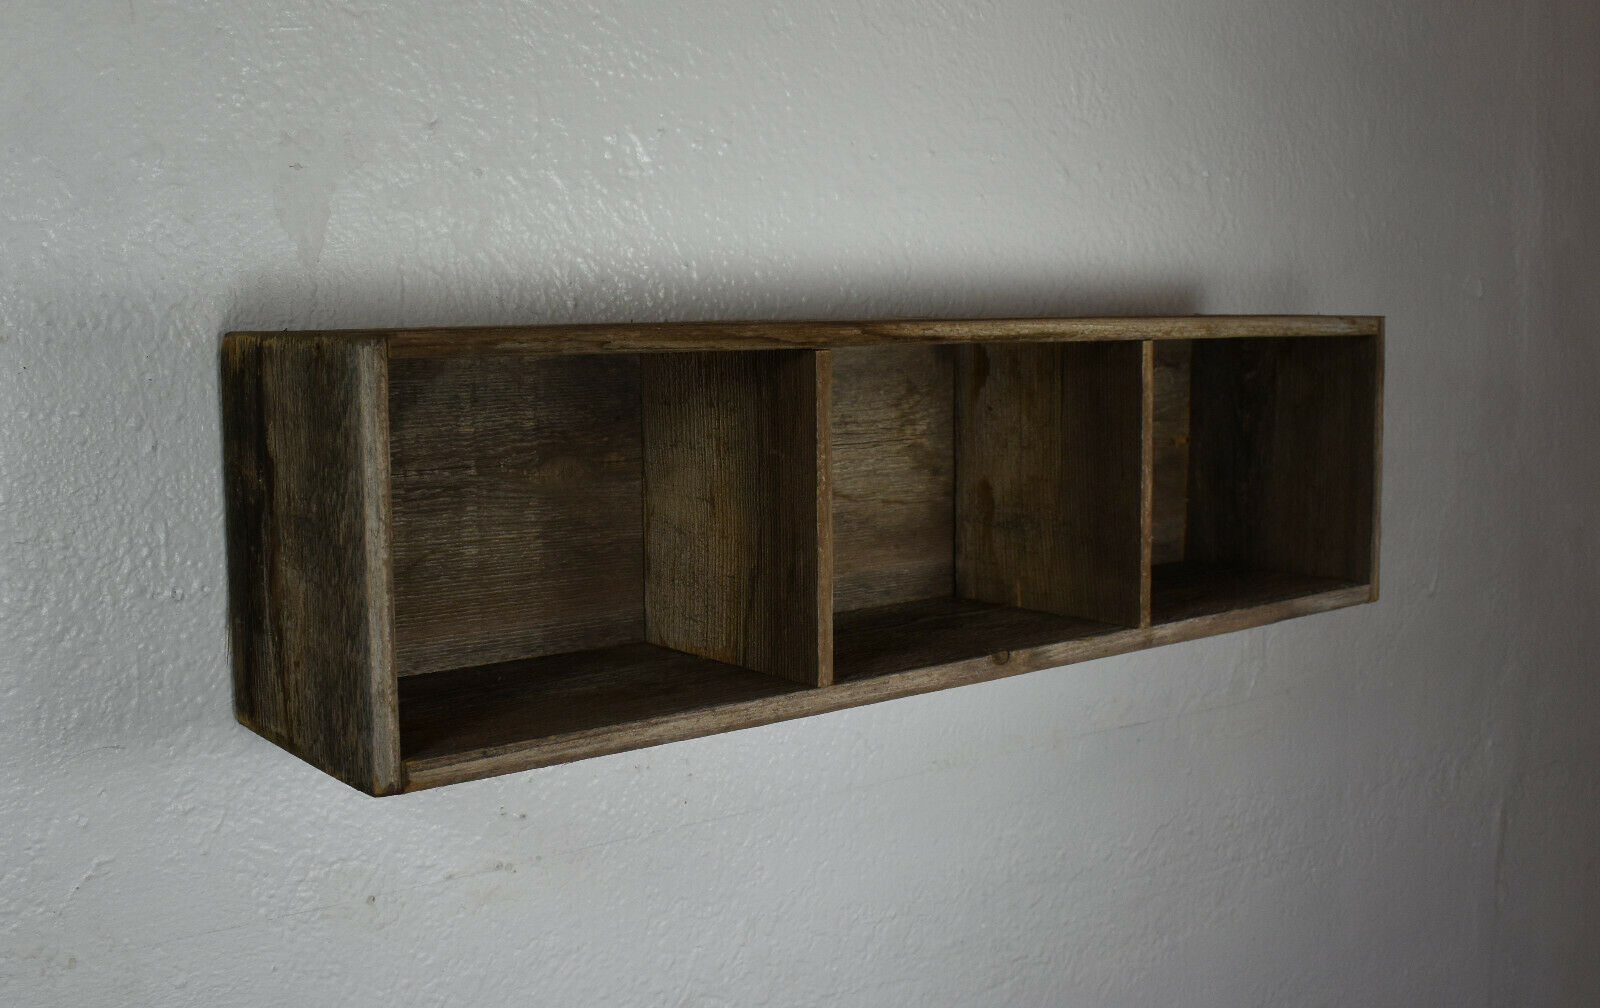 Shadow Box Wall Shelf Reclaimed Wood Rustic 23x6 1 2 Or 3 Cubbies 4 Or 5 Deep